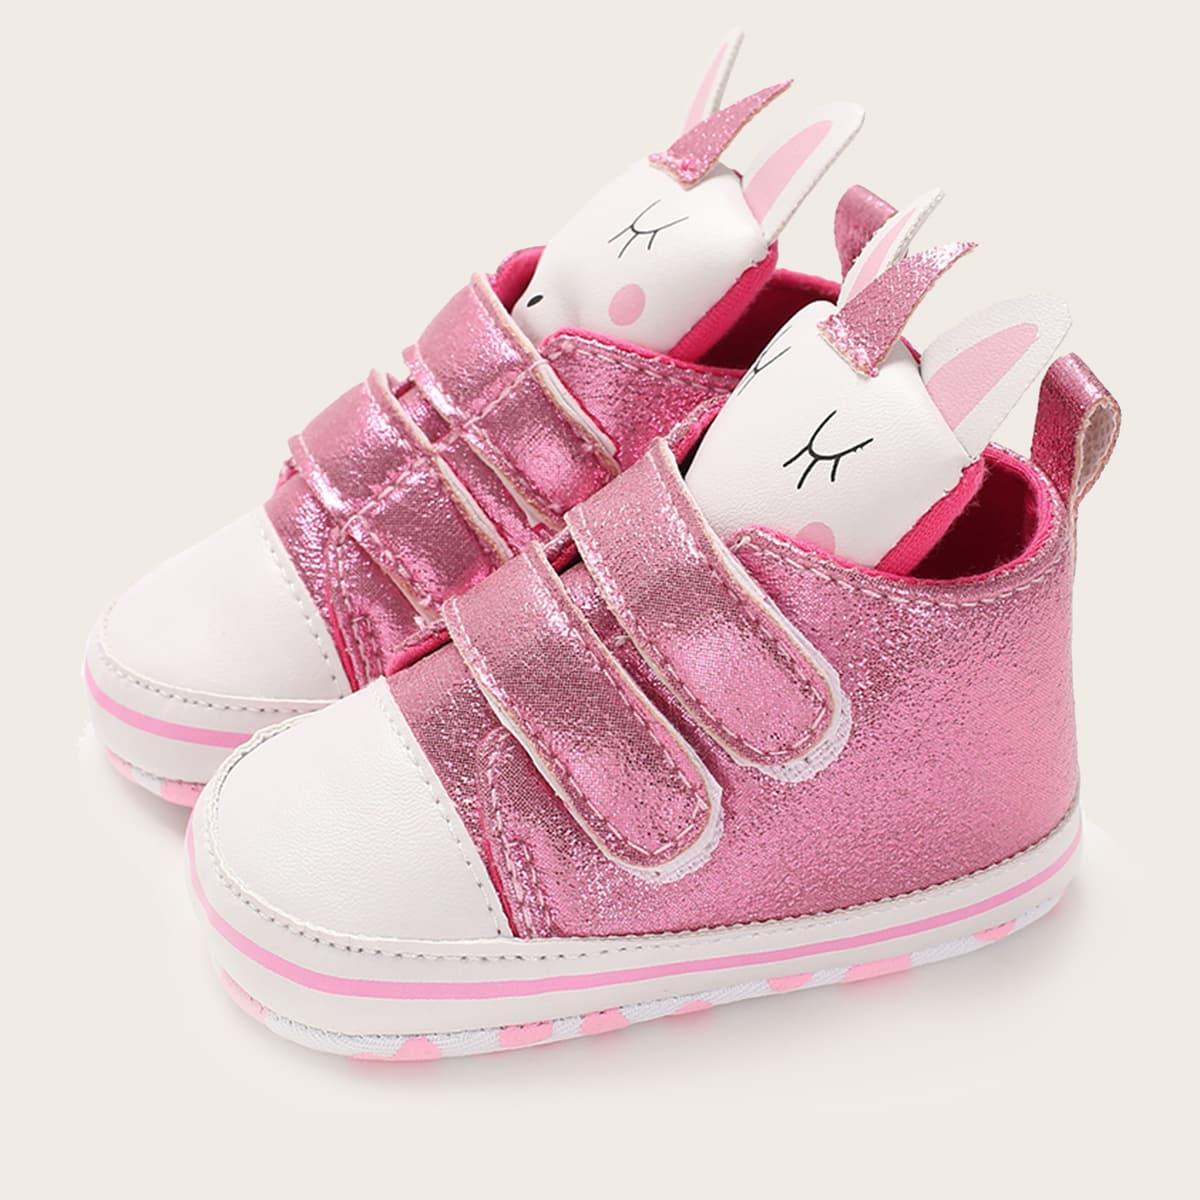 shein Spotprent Baby sneaker